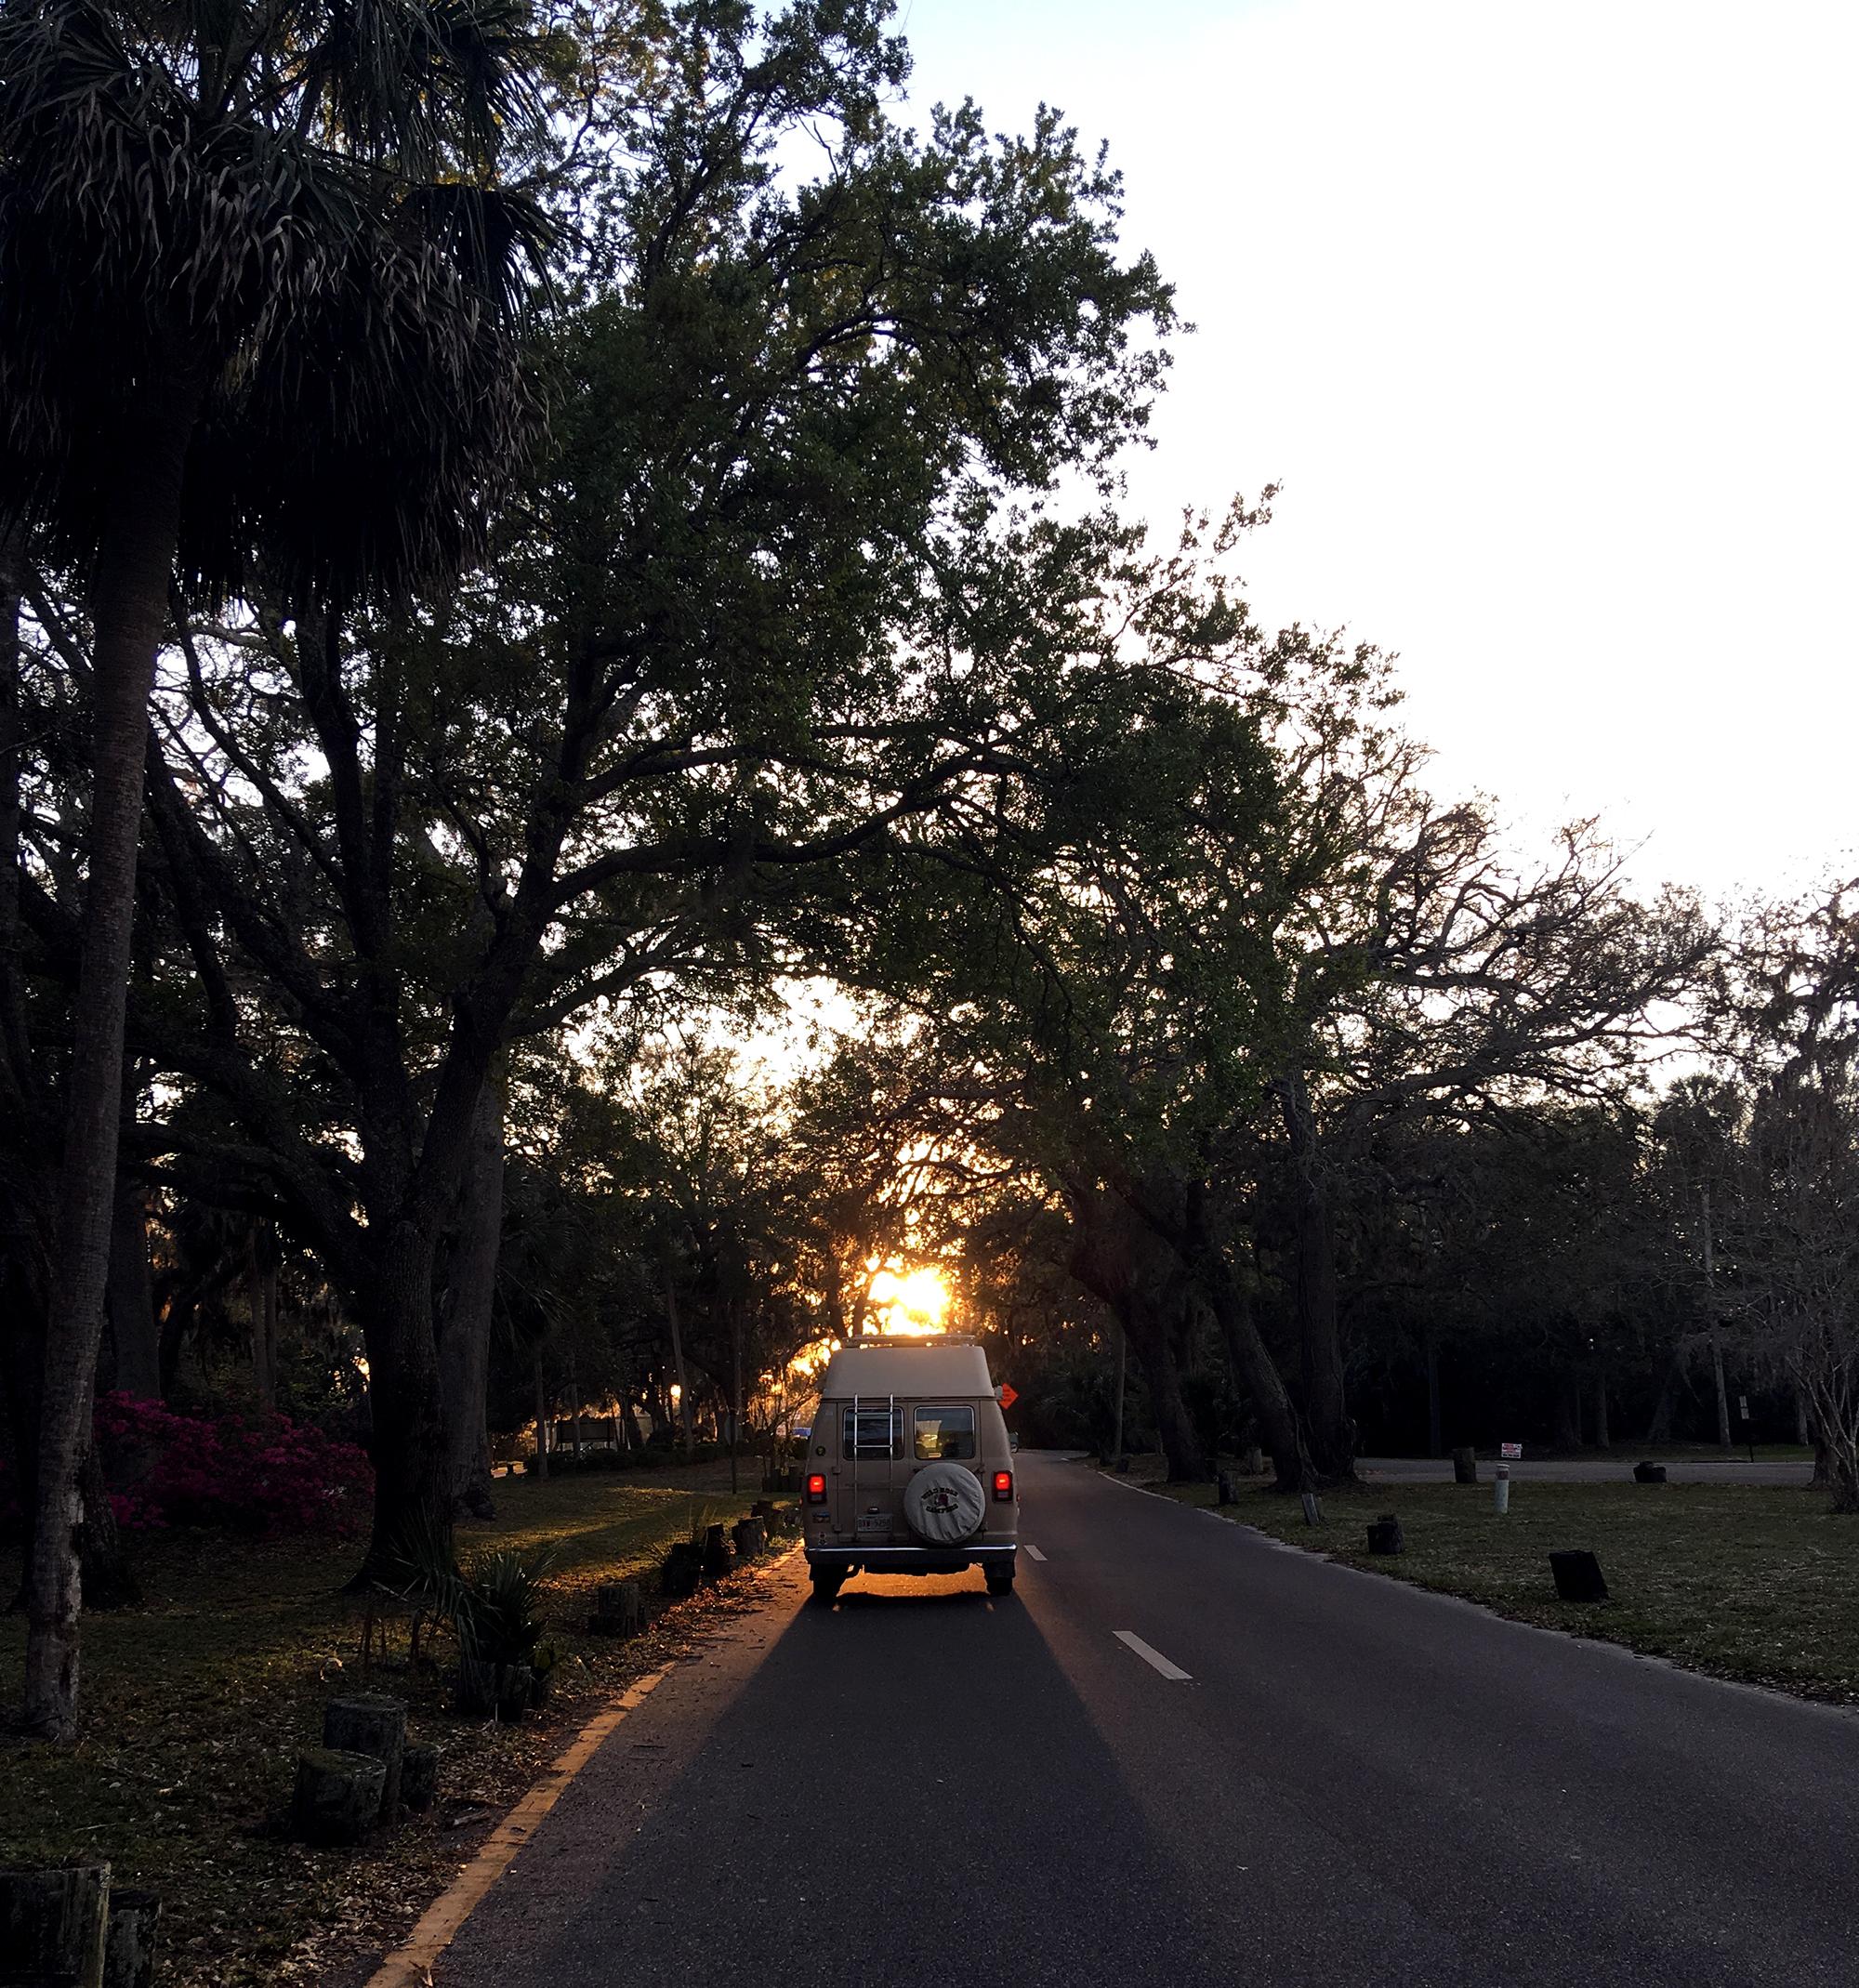 Generic Van Life - Florida Hanna Park